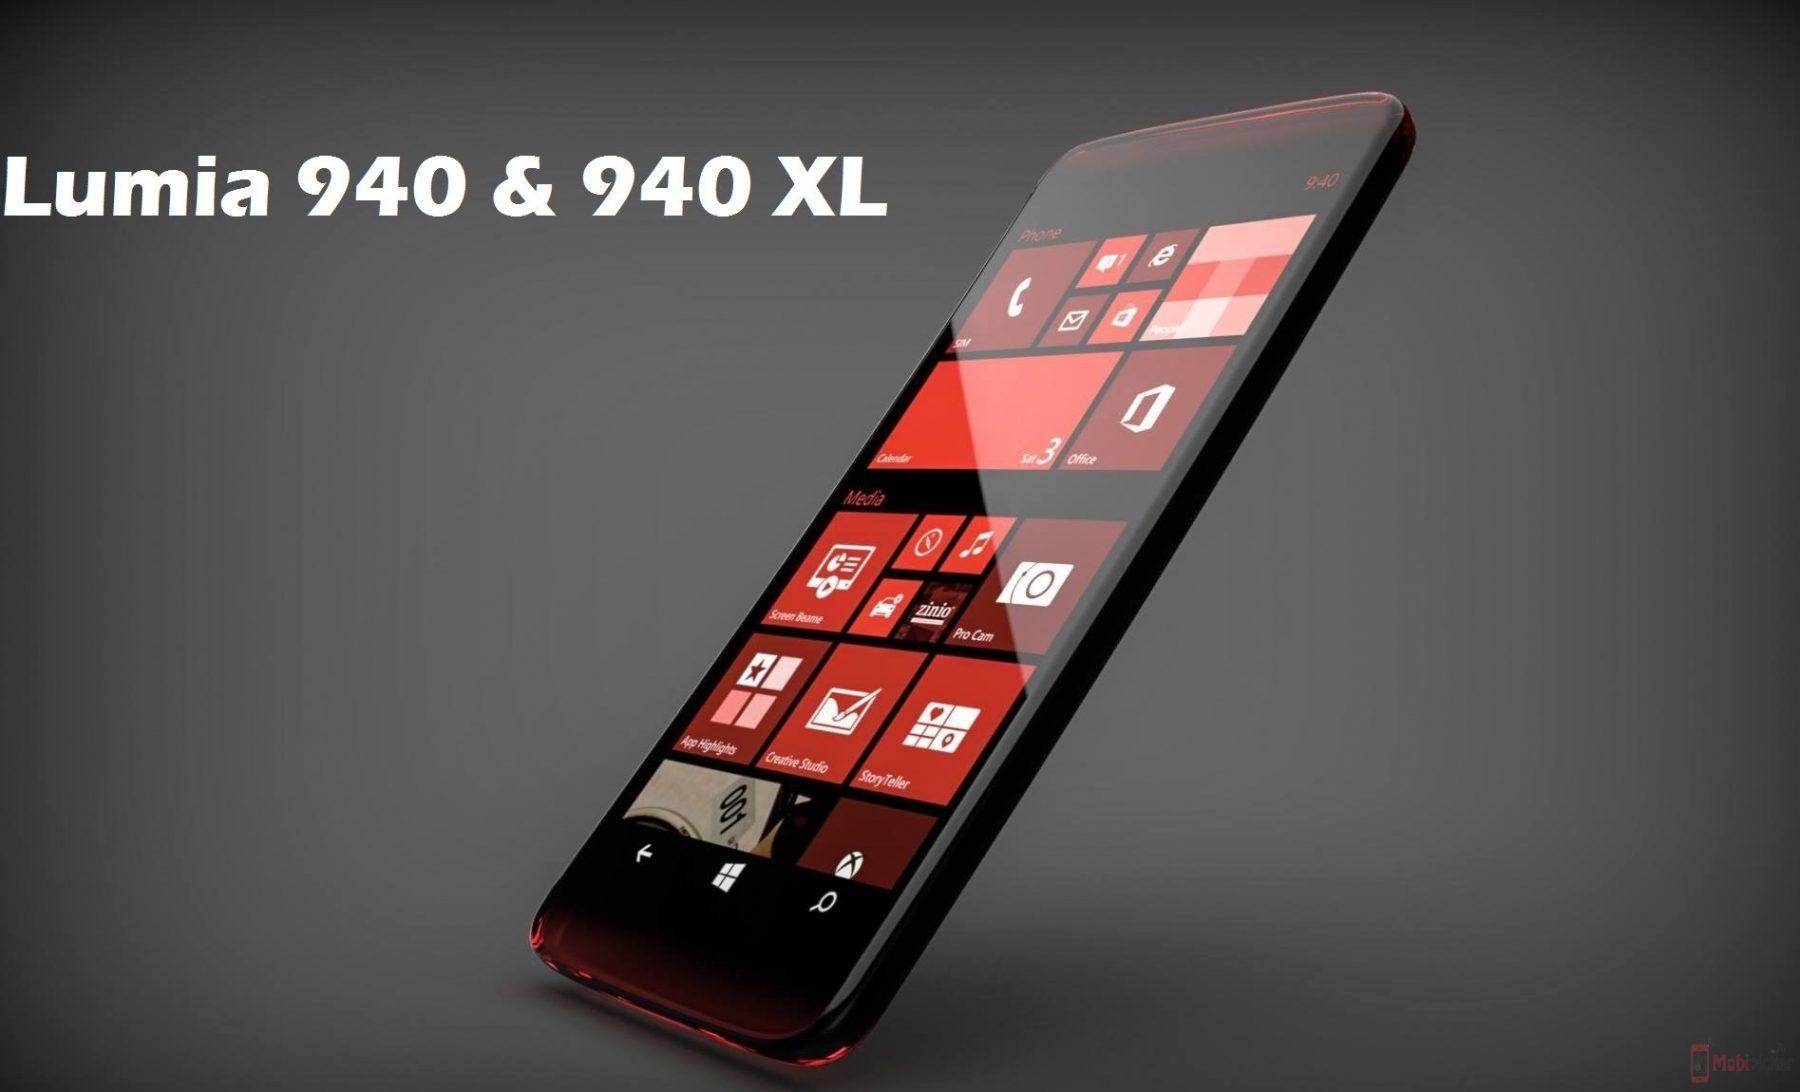 Premium Lumia phones with Microsoft Windows 10 coming soon